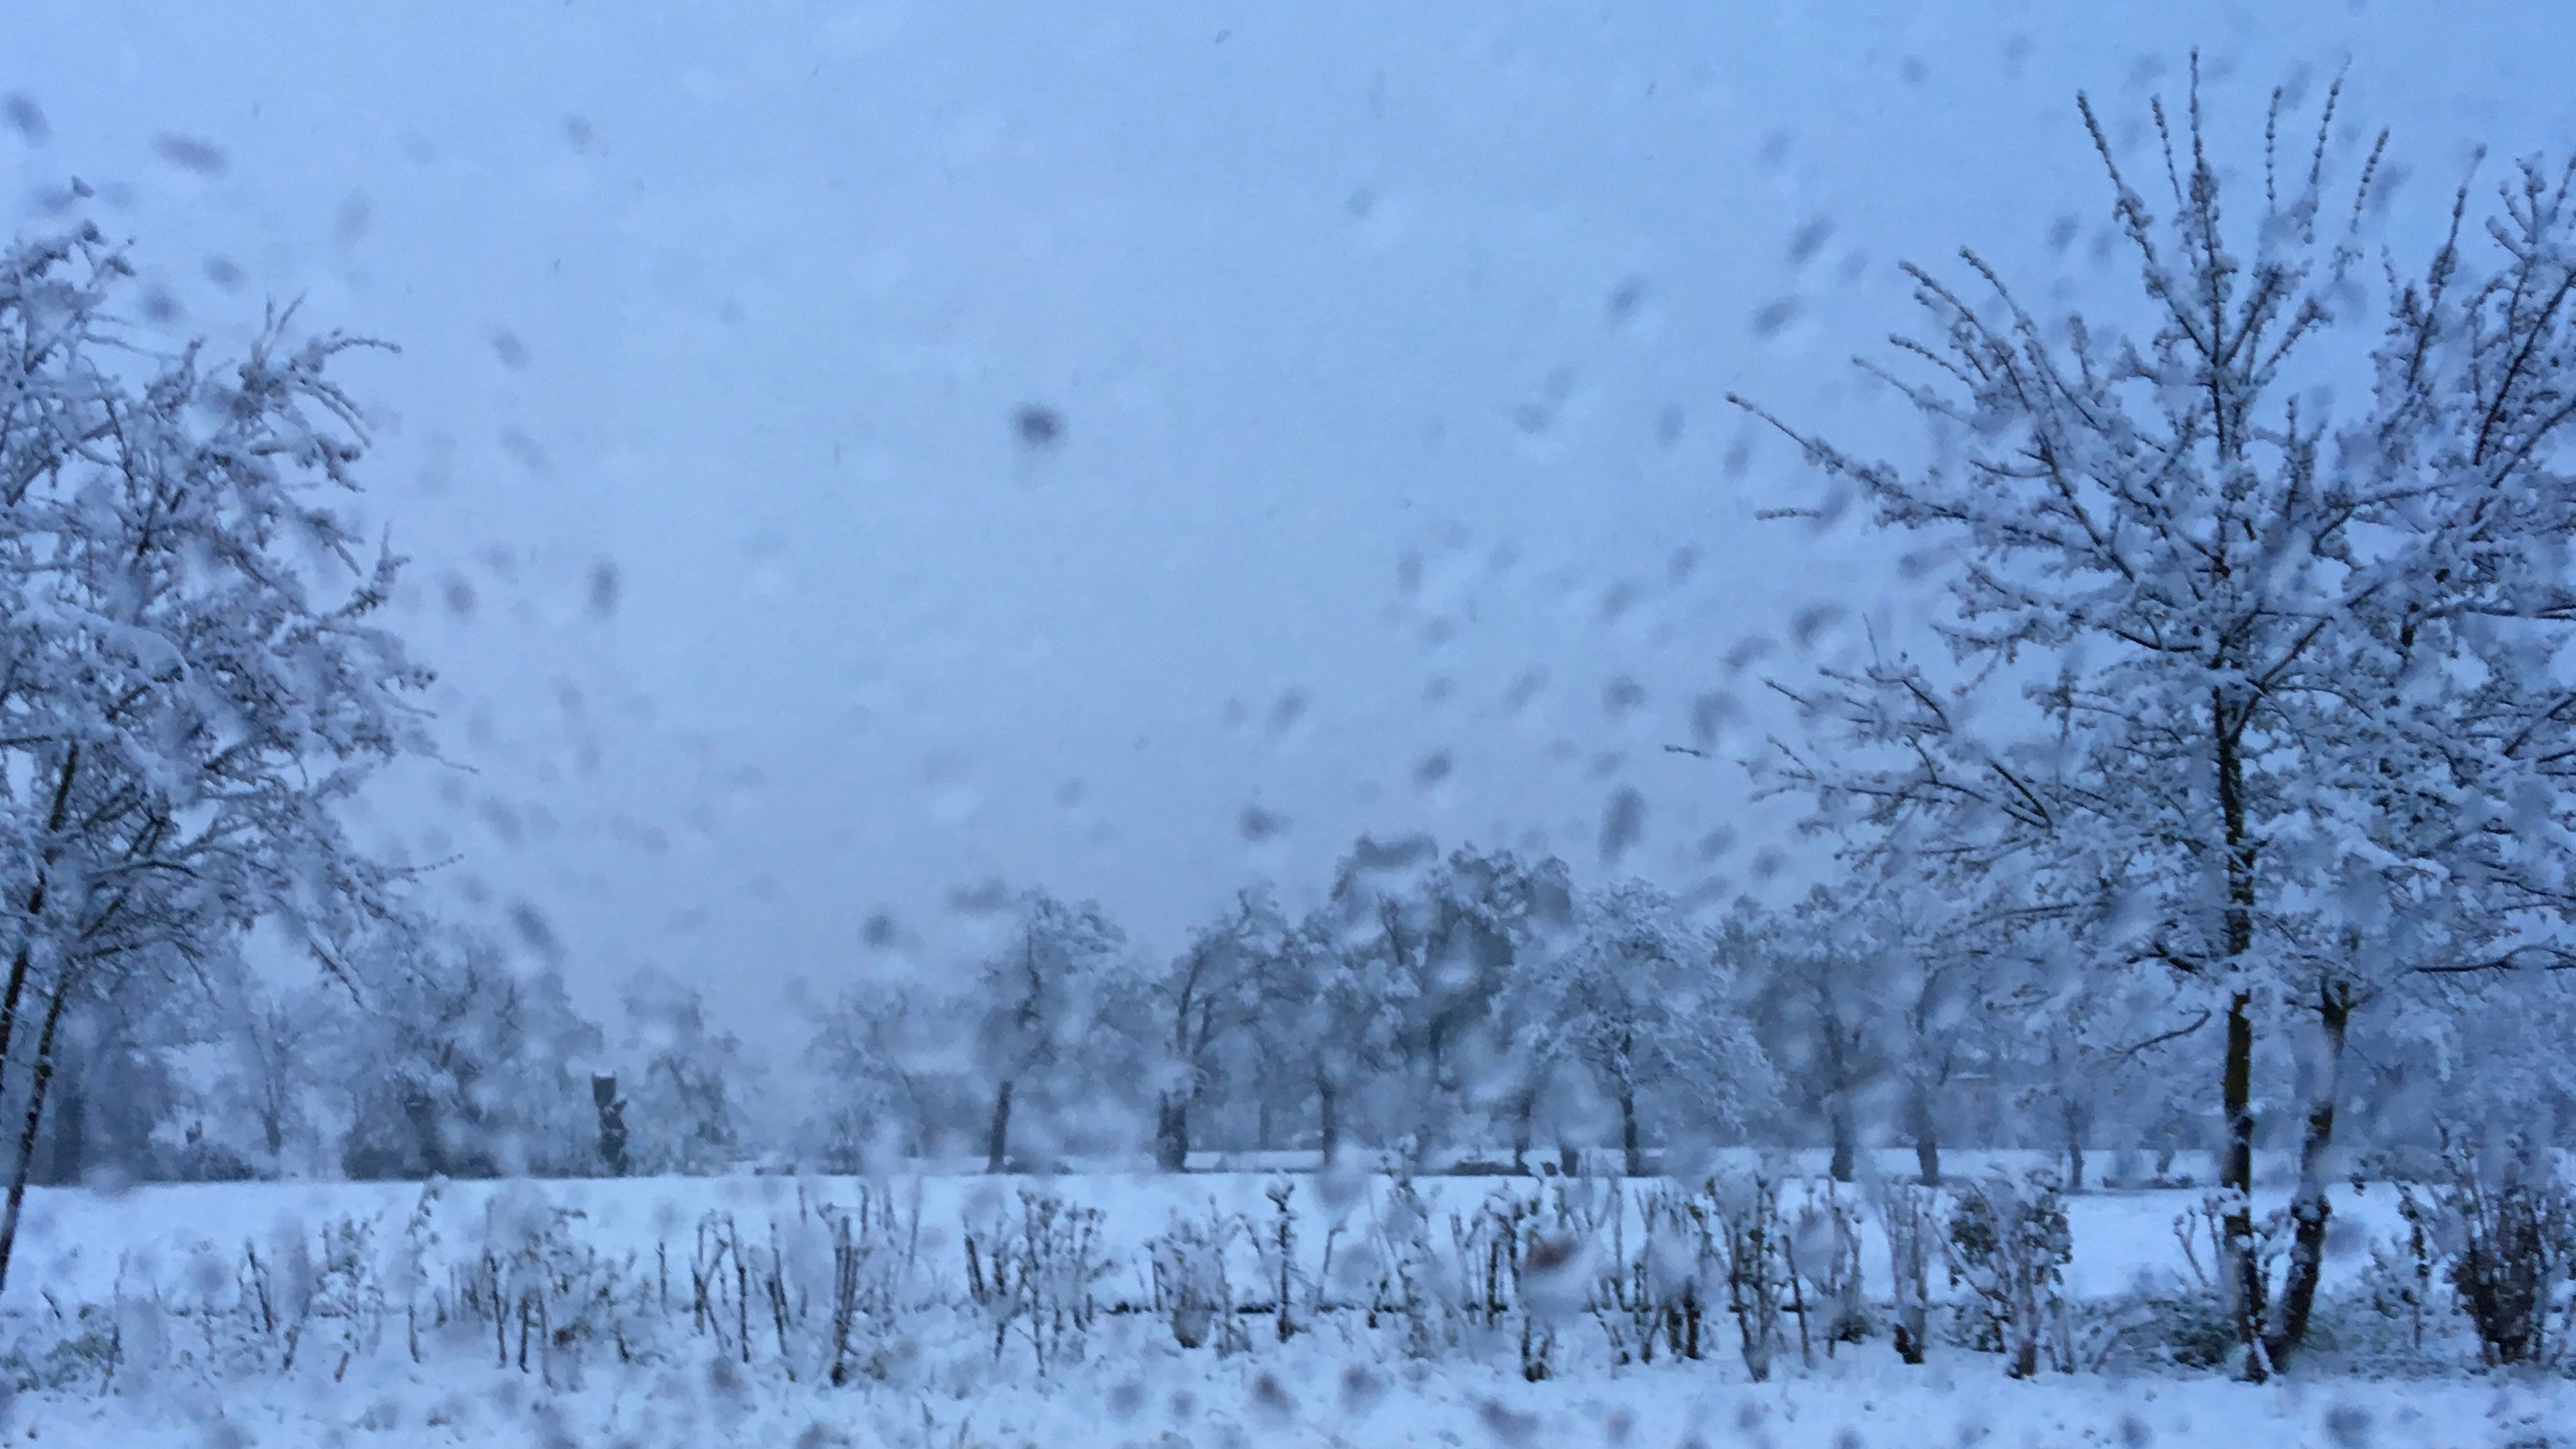 190404_voiture_neige_2